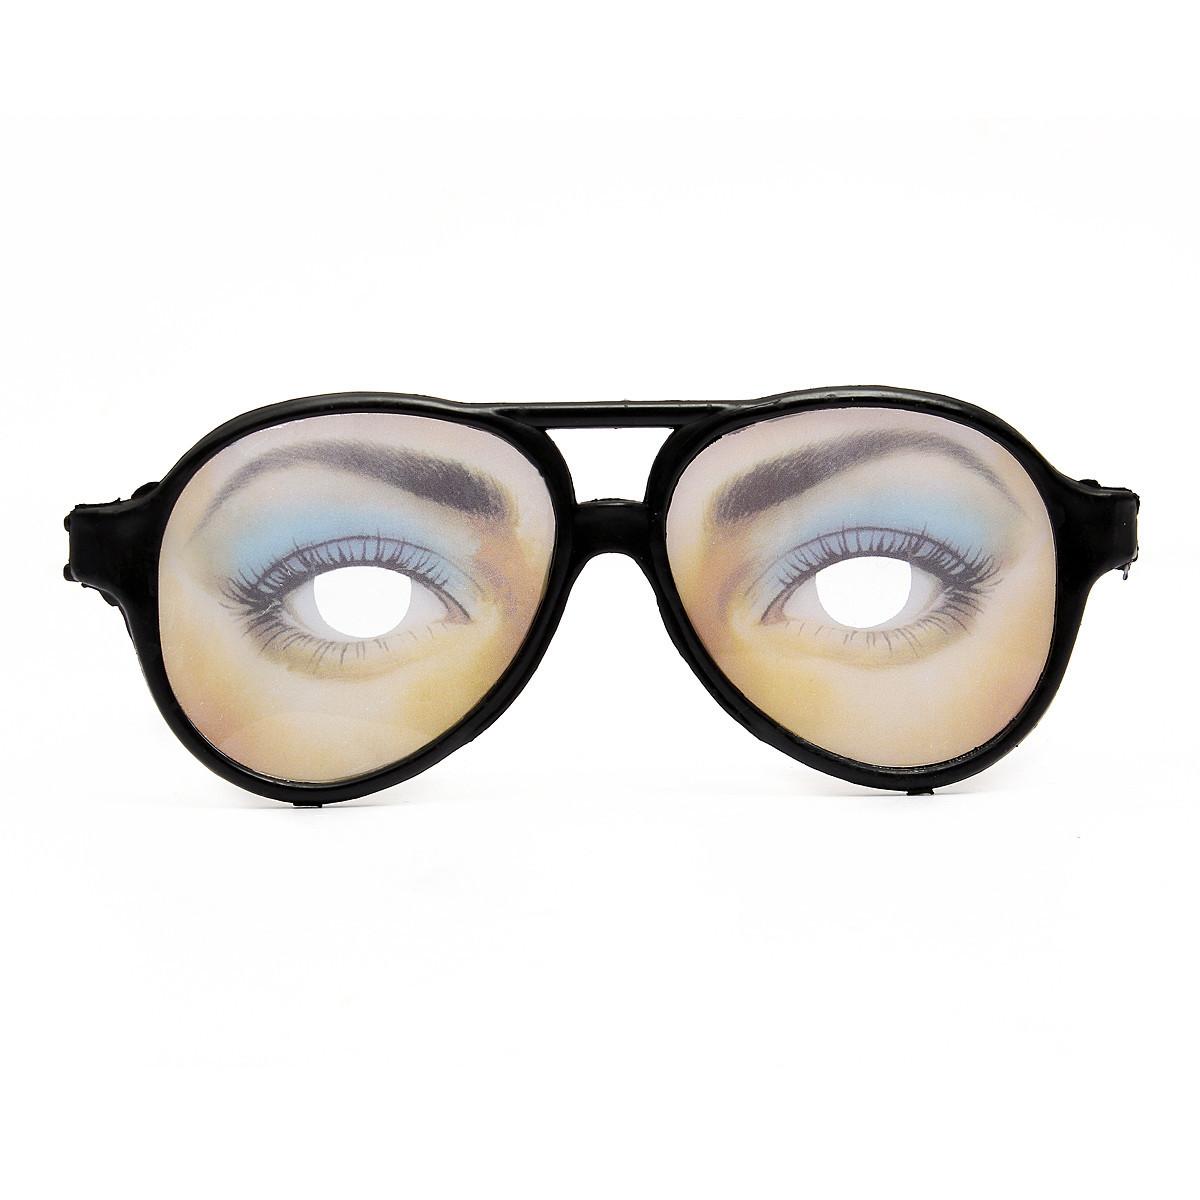 Large Frame Fake Glasses : Funny Fake Eye Glasses Big Frame Joke Fancy Dress Party ...